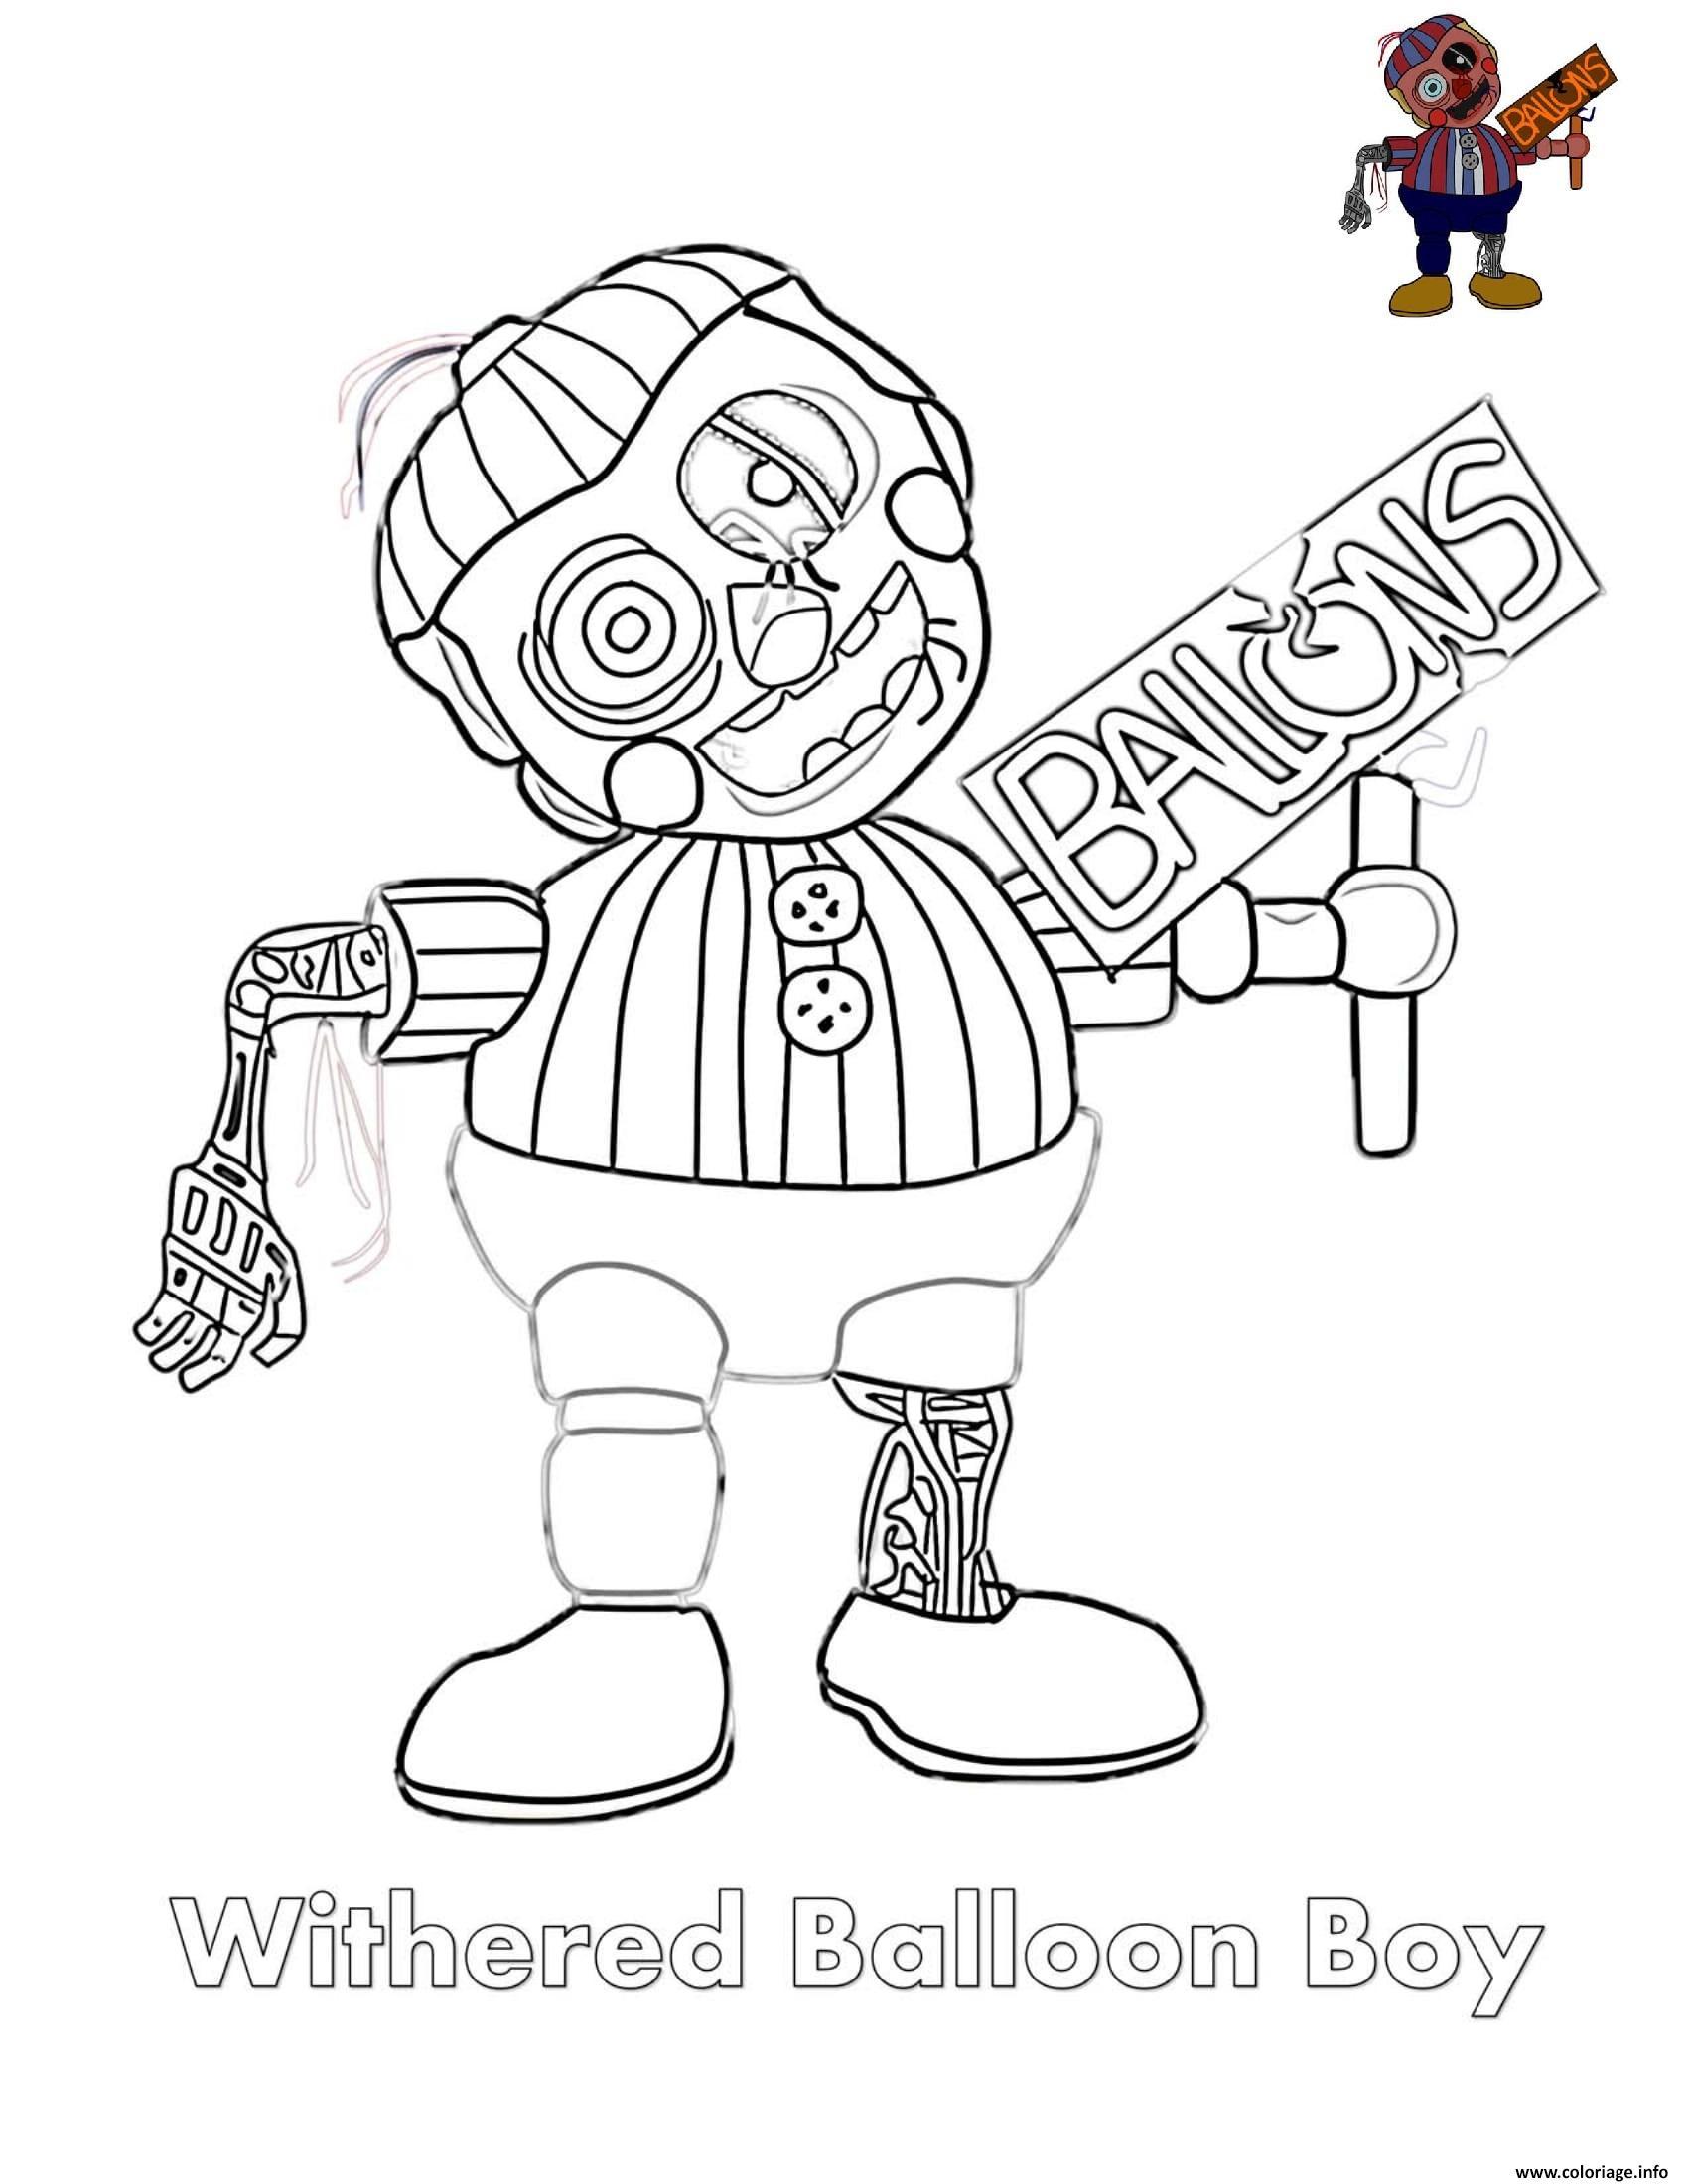 Dessin Withered Balloon Boy FNAF Coloriage Gratuit à Imprimer